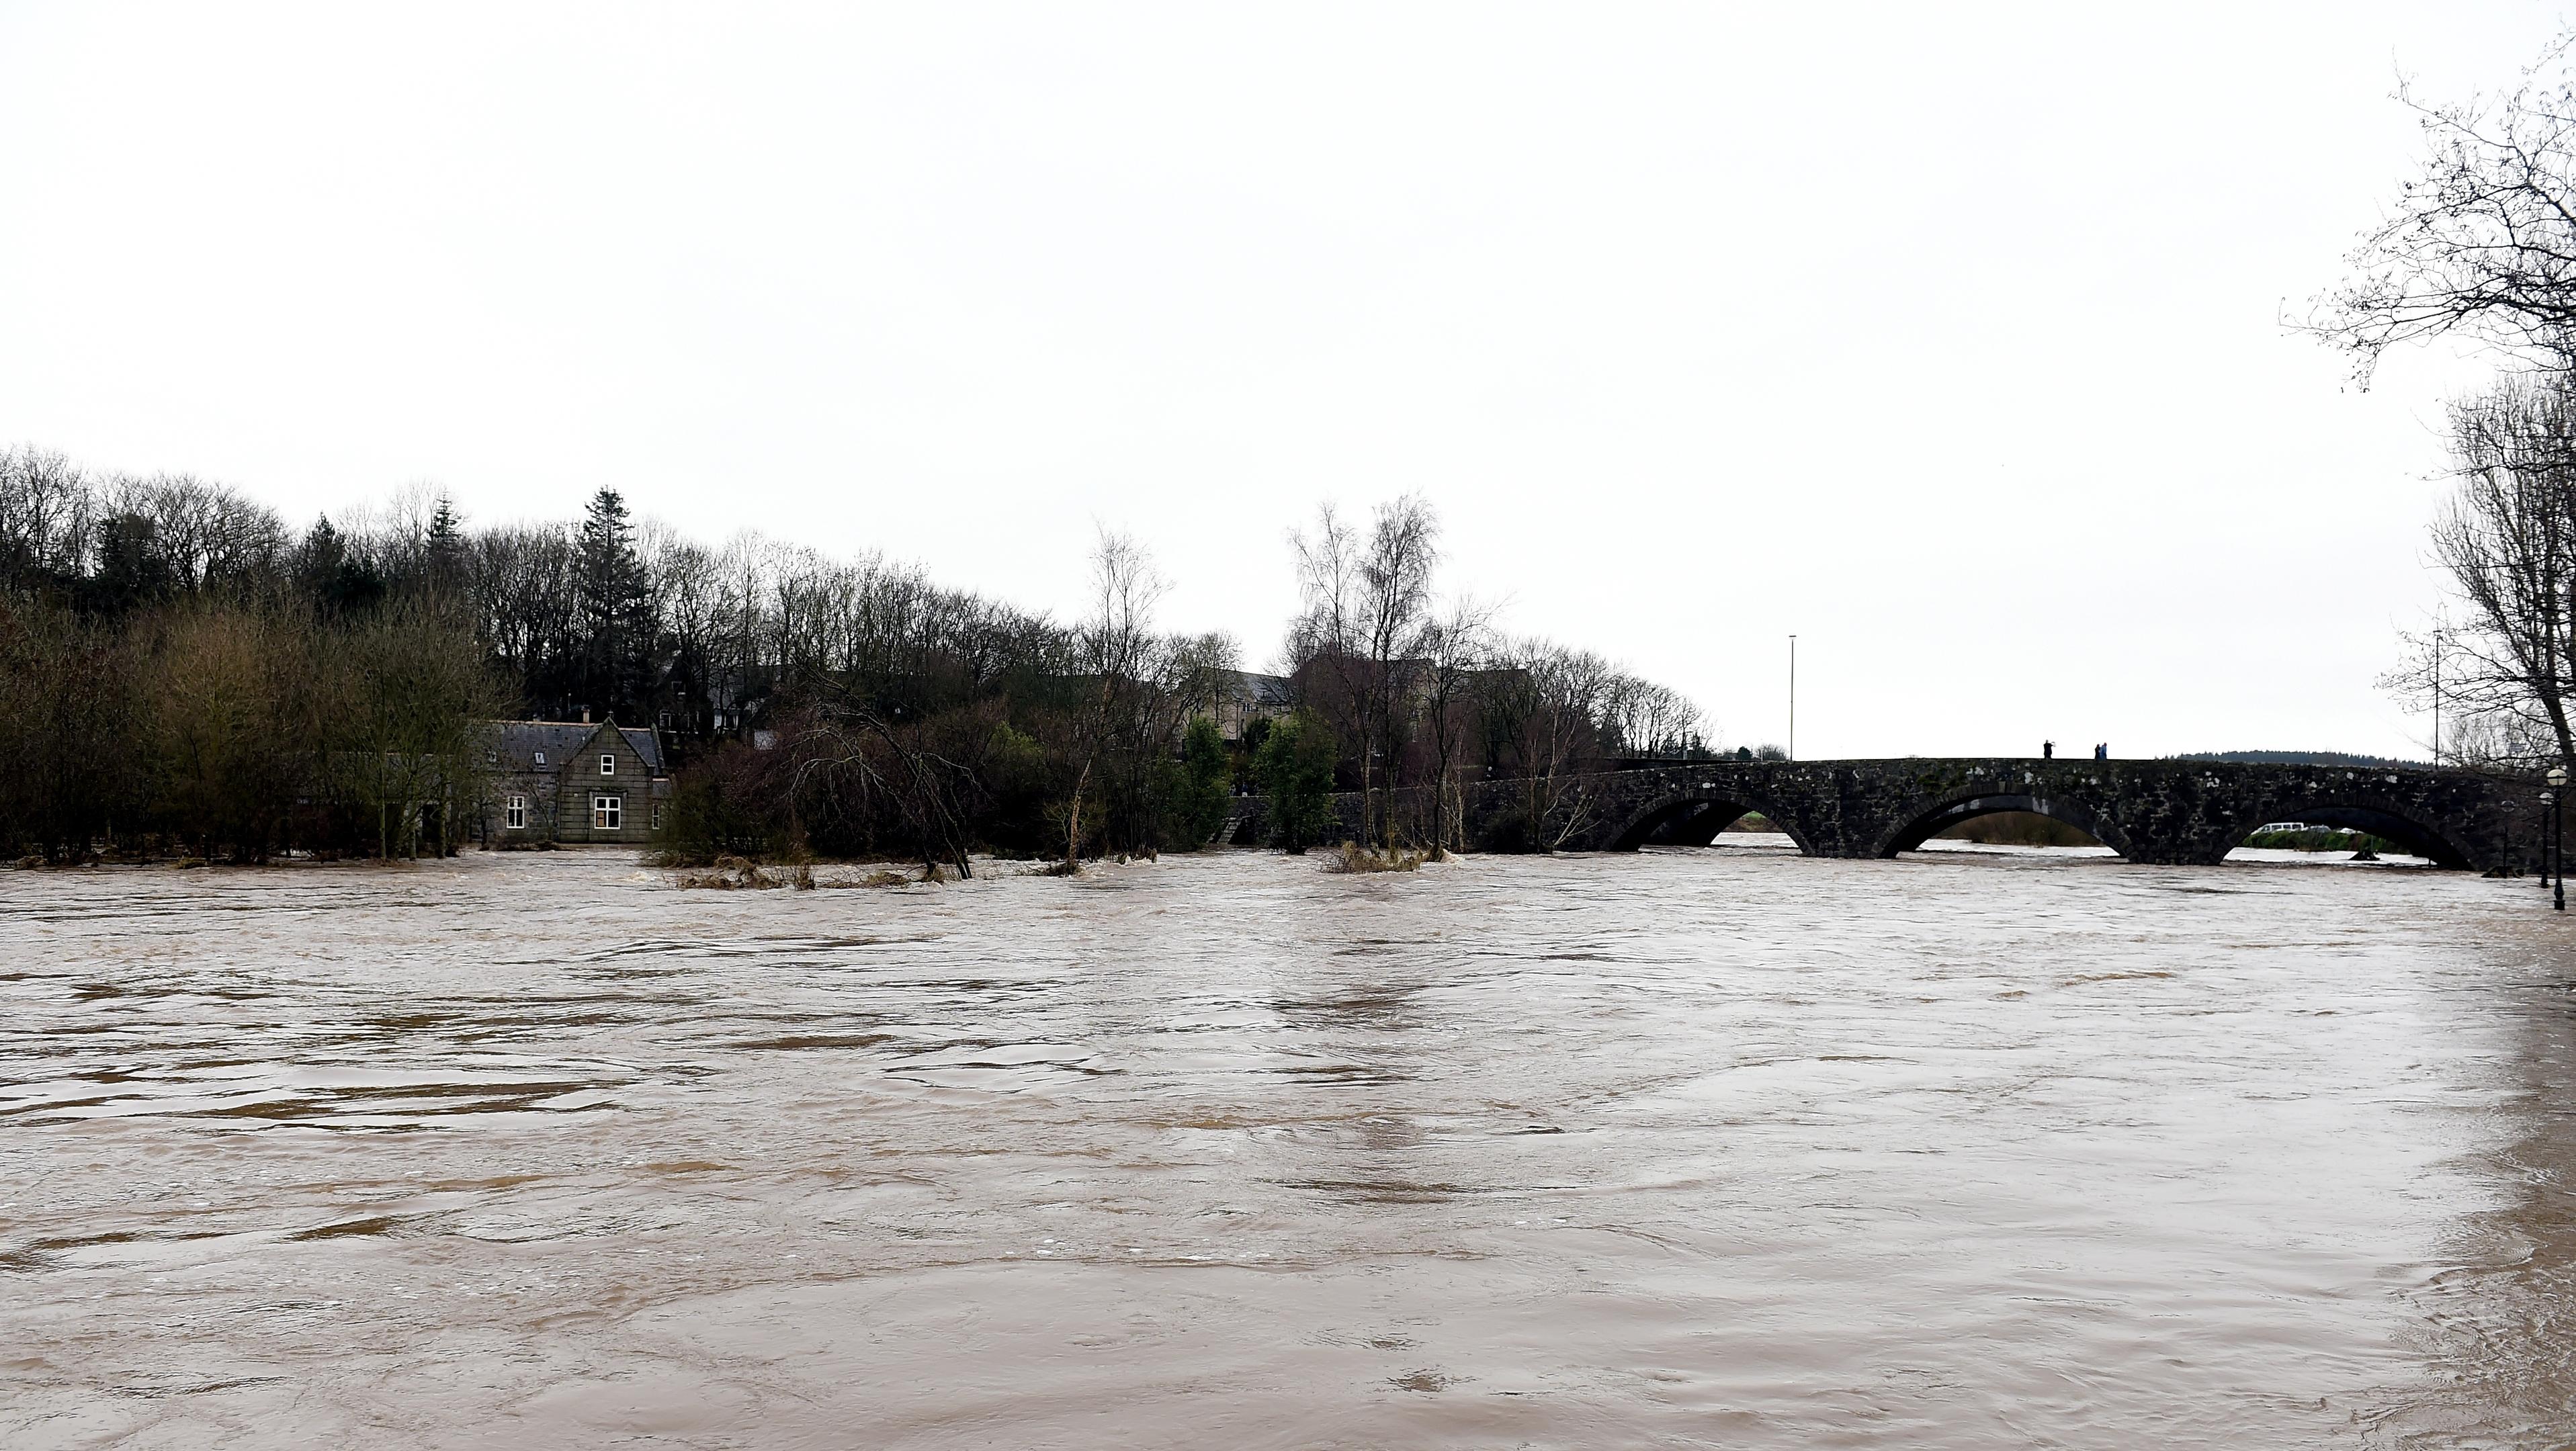 The River Ythan has burst it's banks at Ellon.